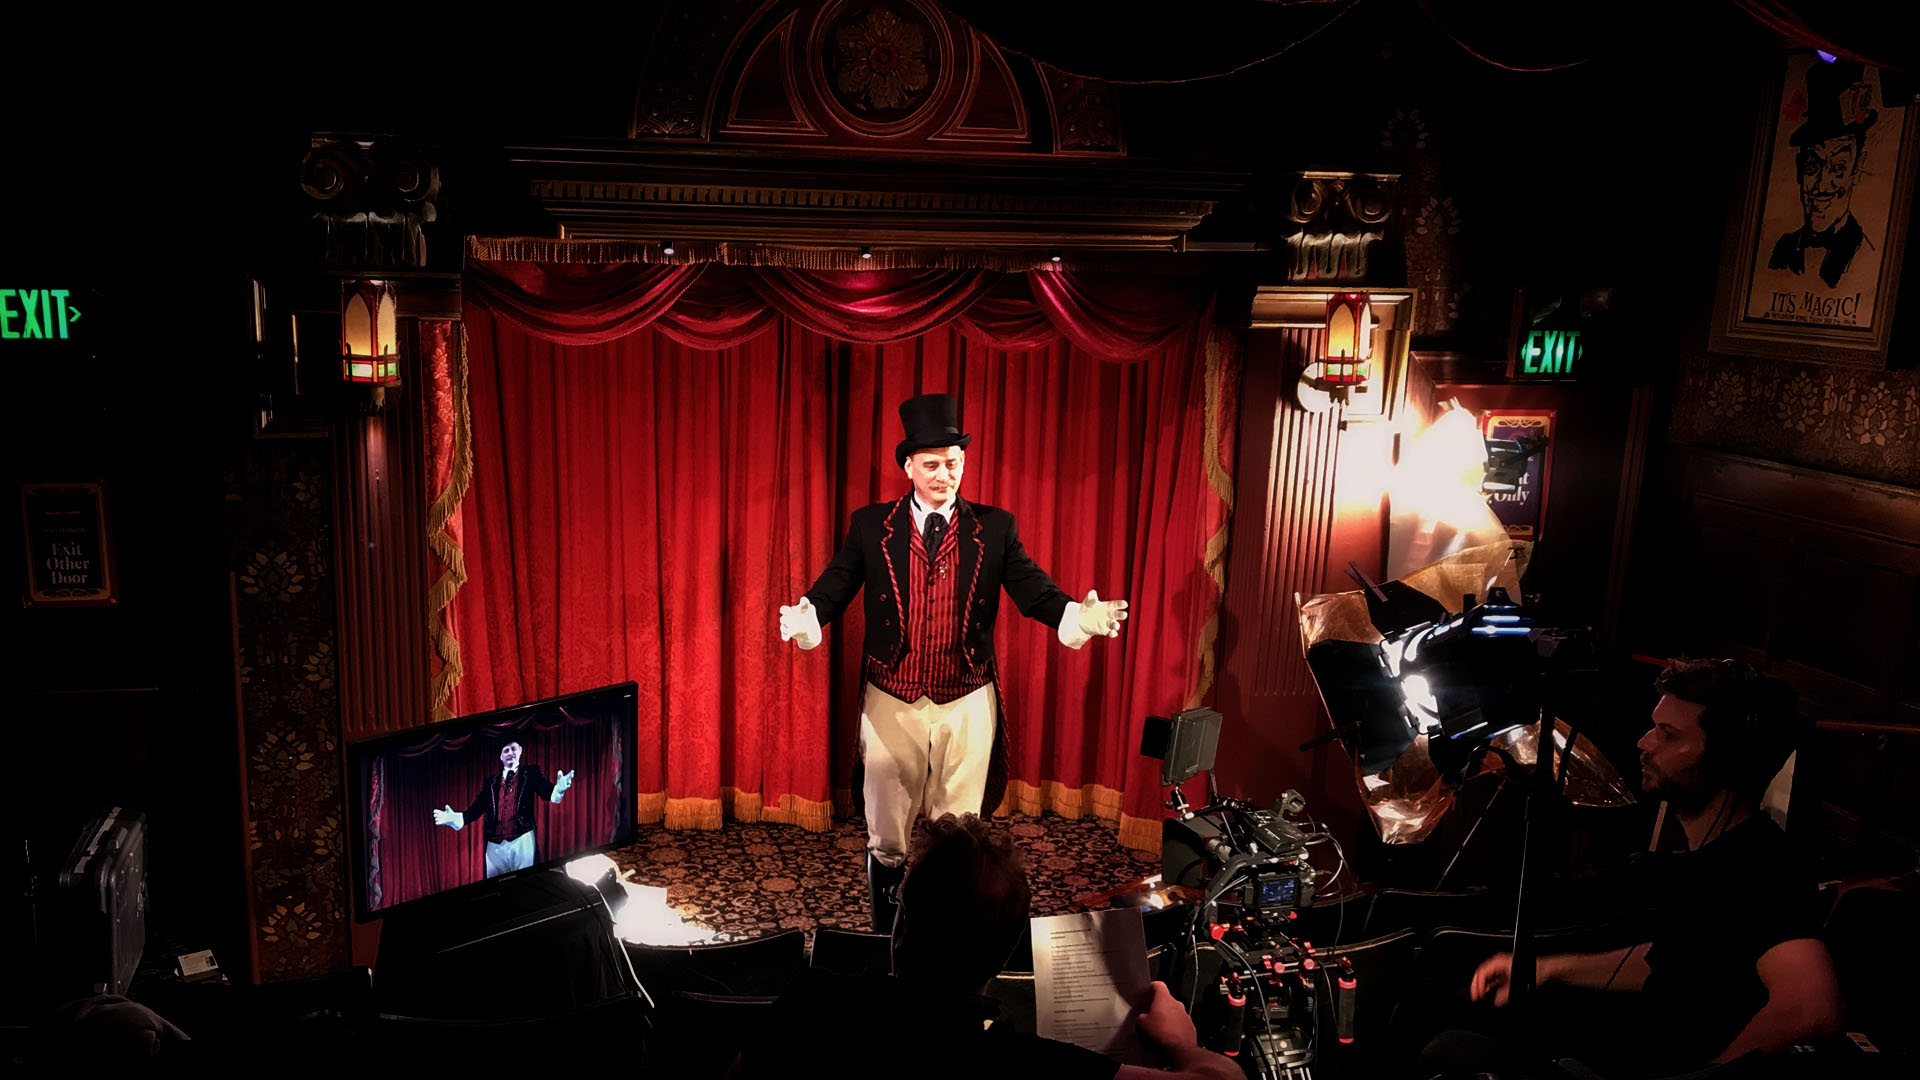 Circus 1903 David Williamson Filming Production Company